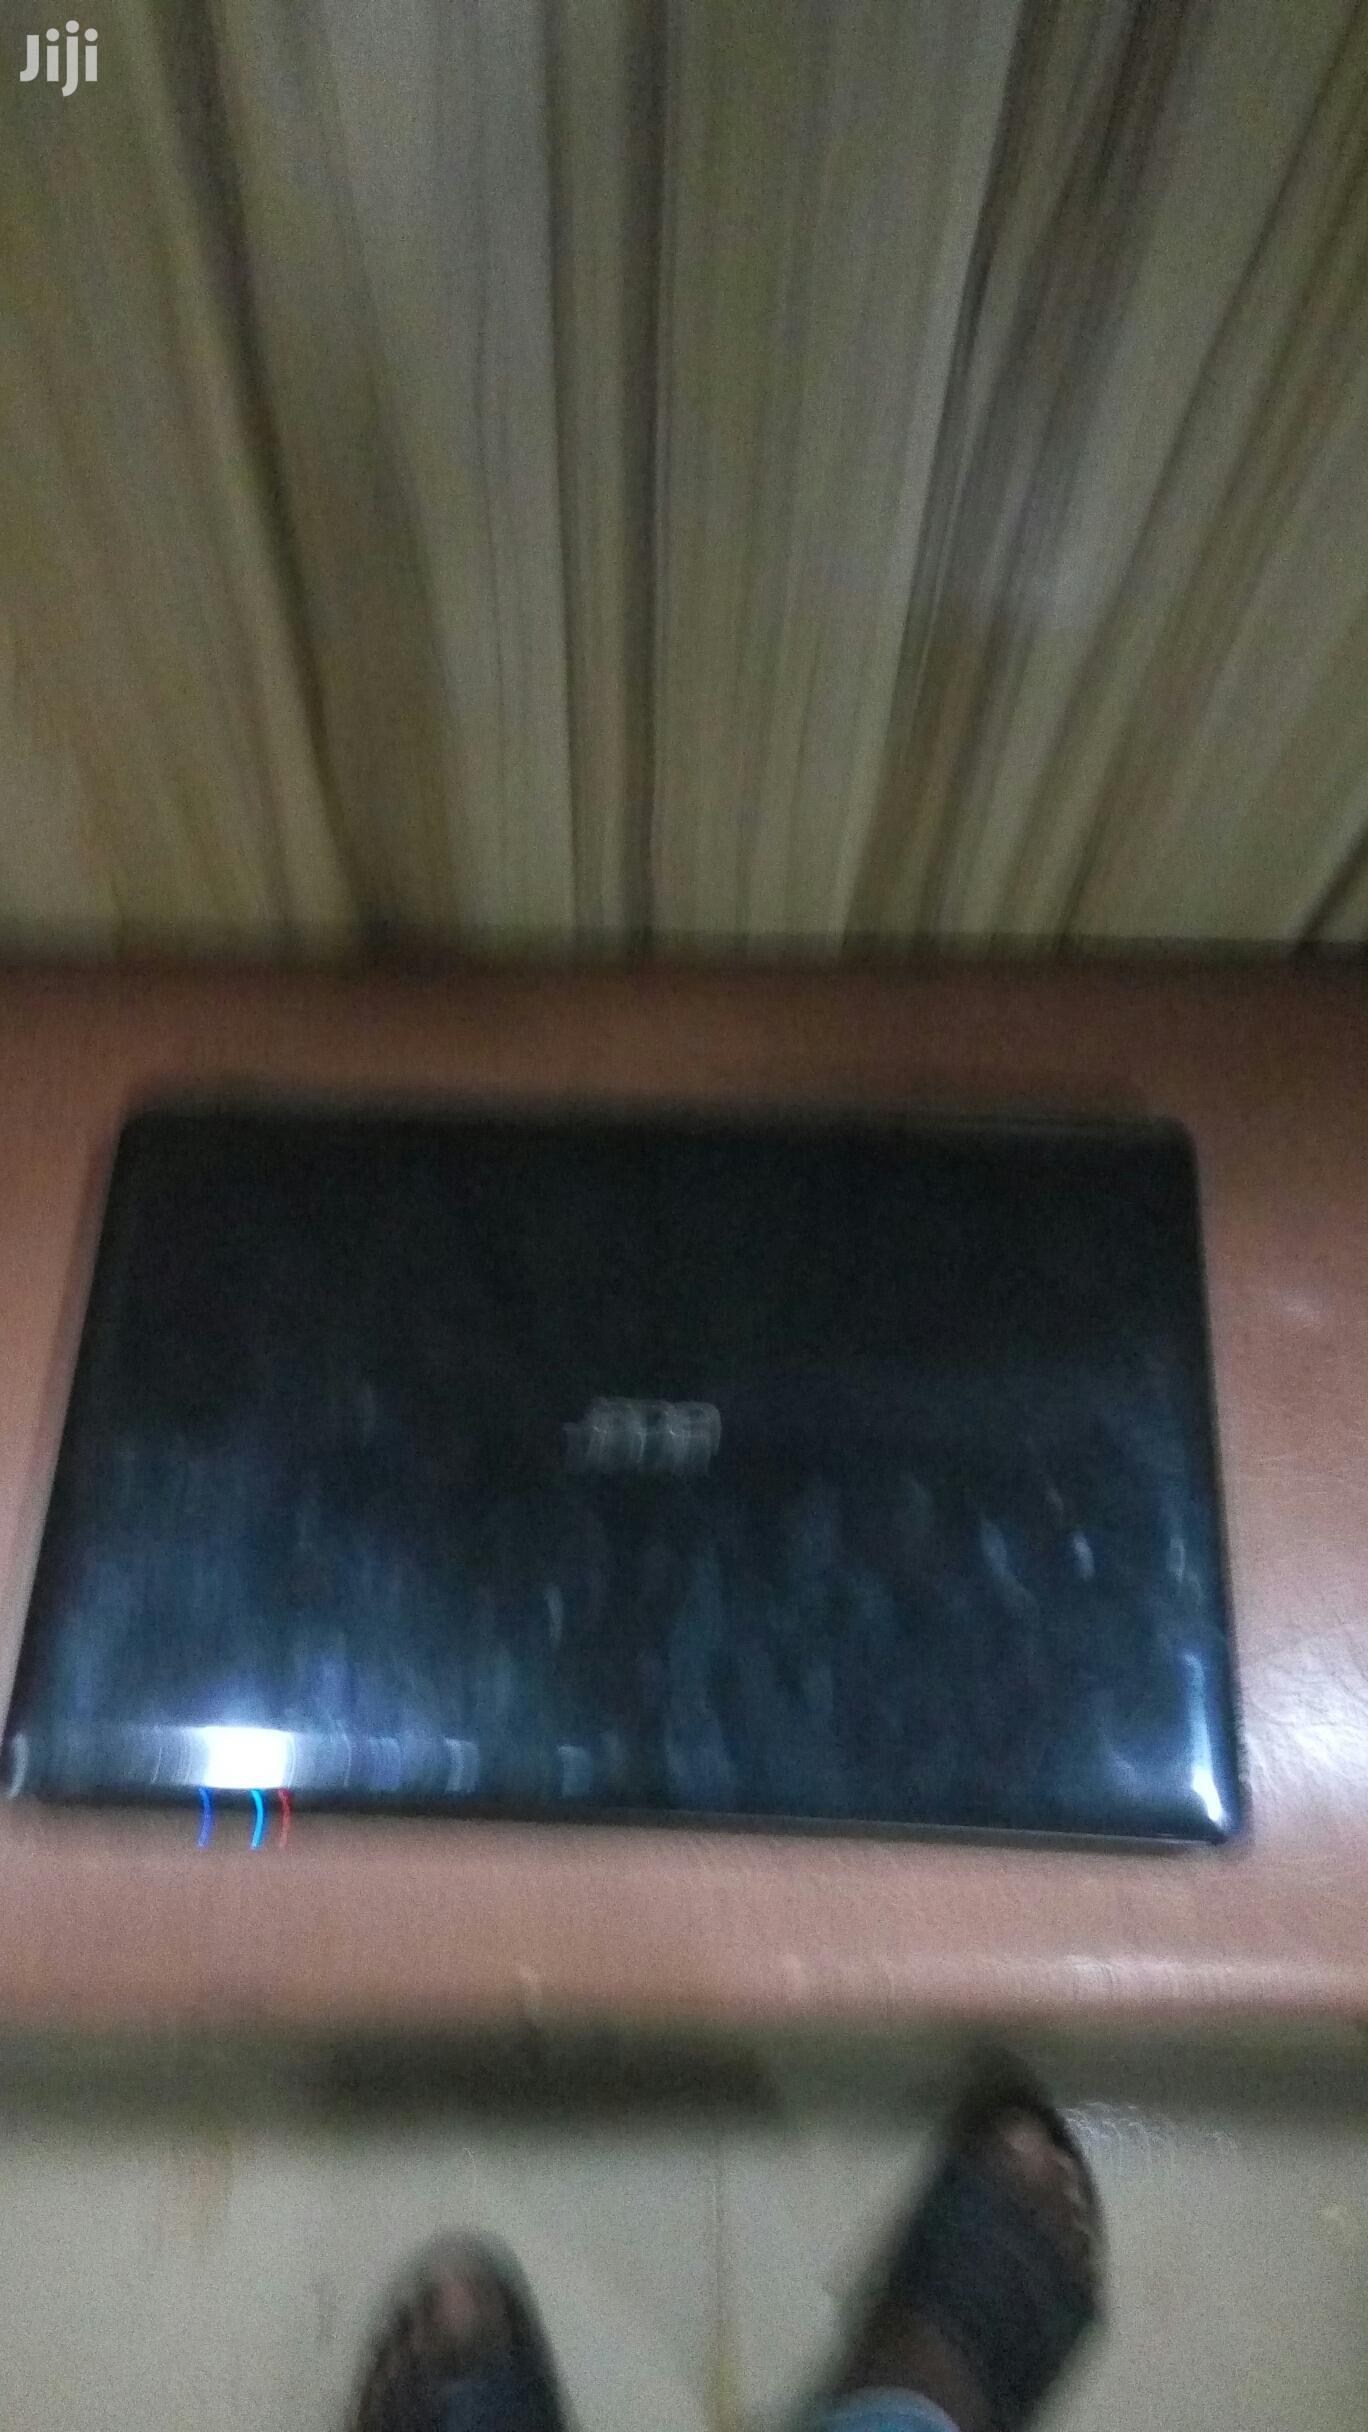 Laptop Acer Aspire 5570 8GB Intel Core i5 HDD 500GB